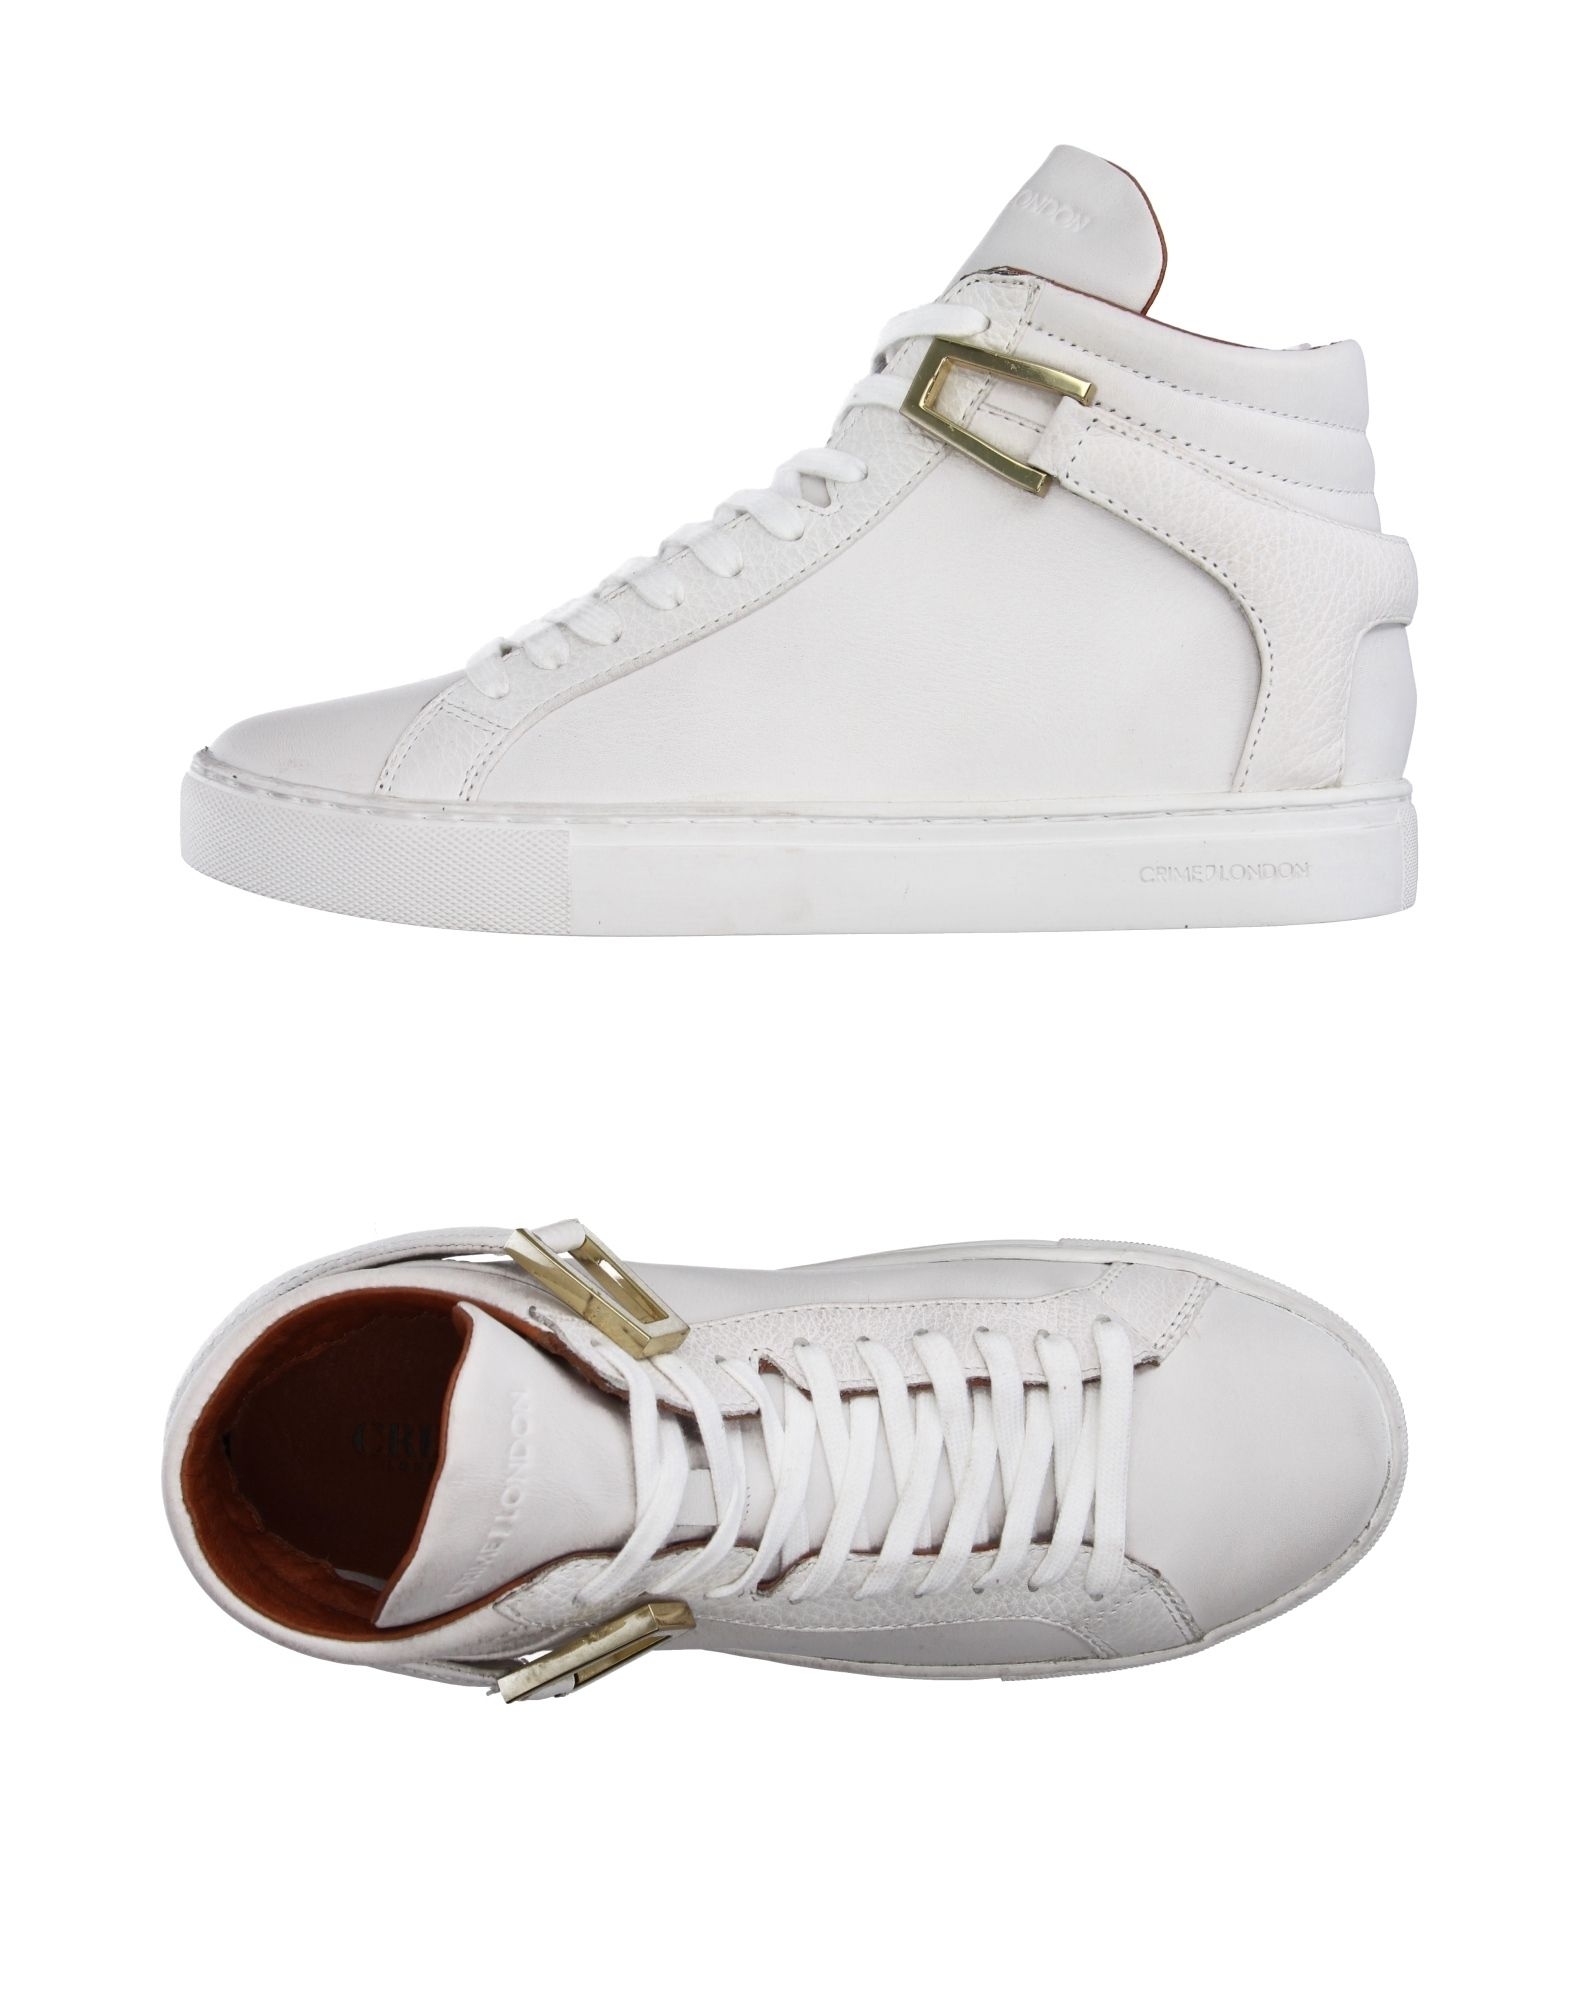 Crime London Sneakers Damen  11165979UN beliebte Gute Qualität beliebte 11165979UN Schuhe f2f753